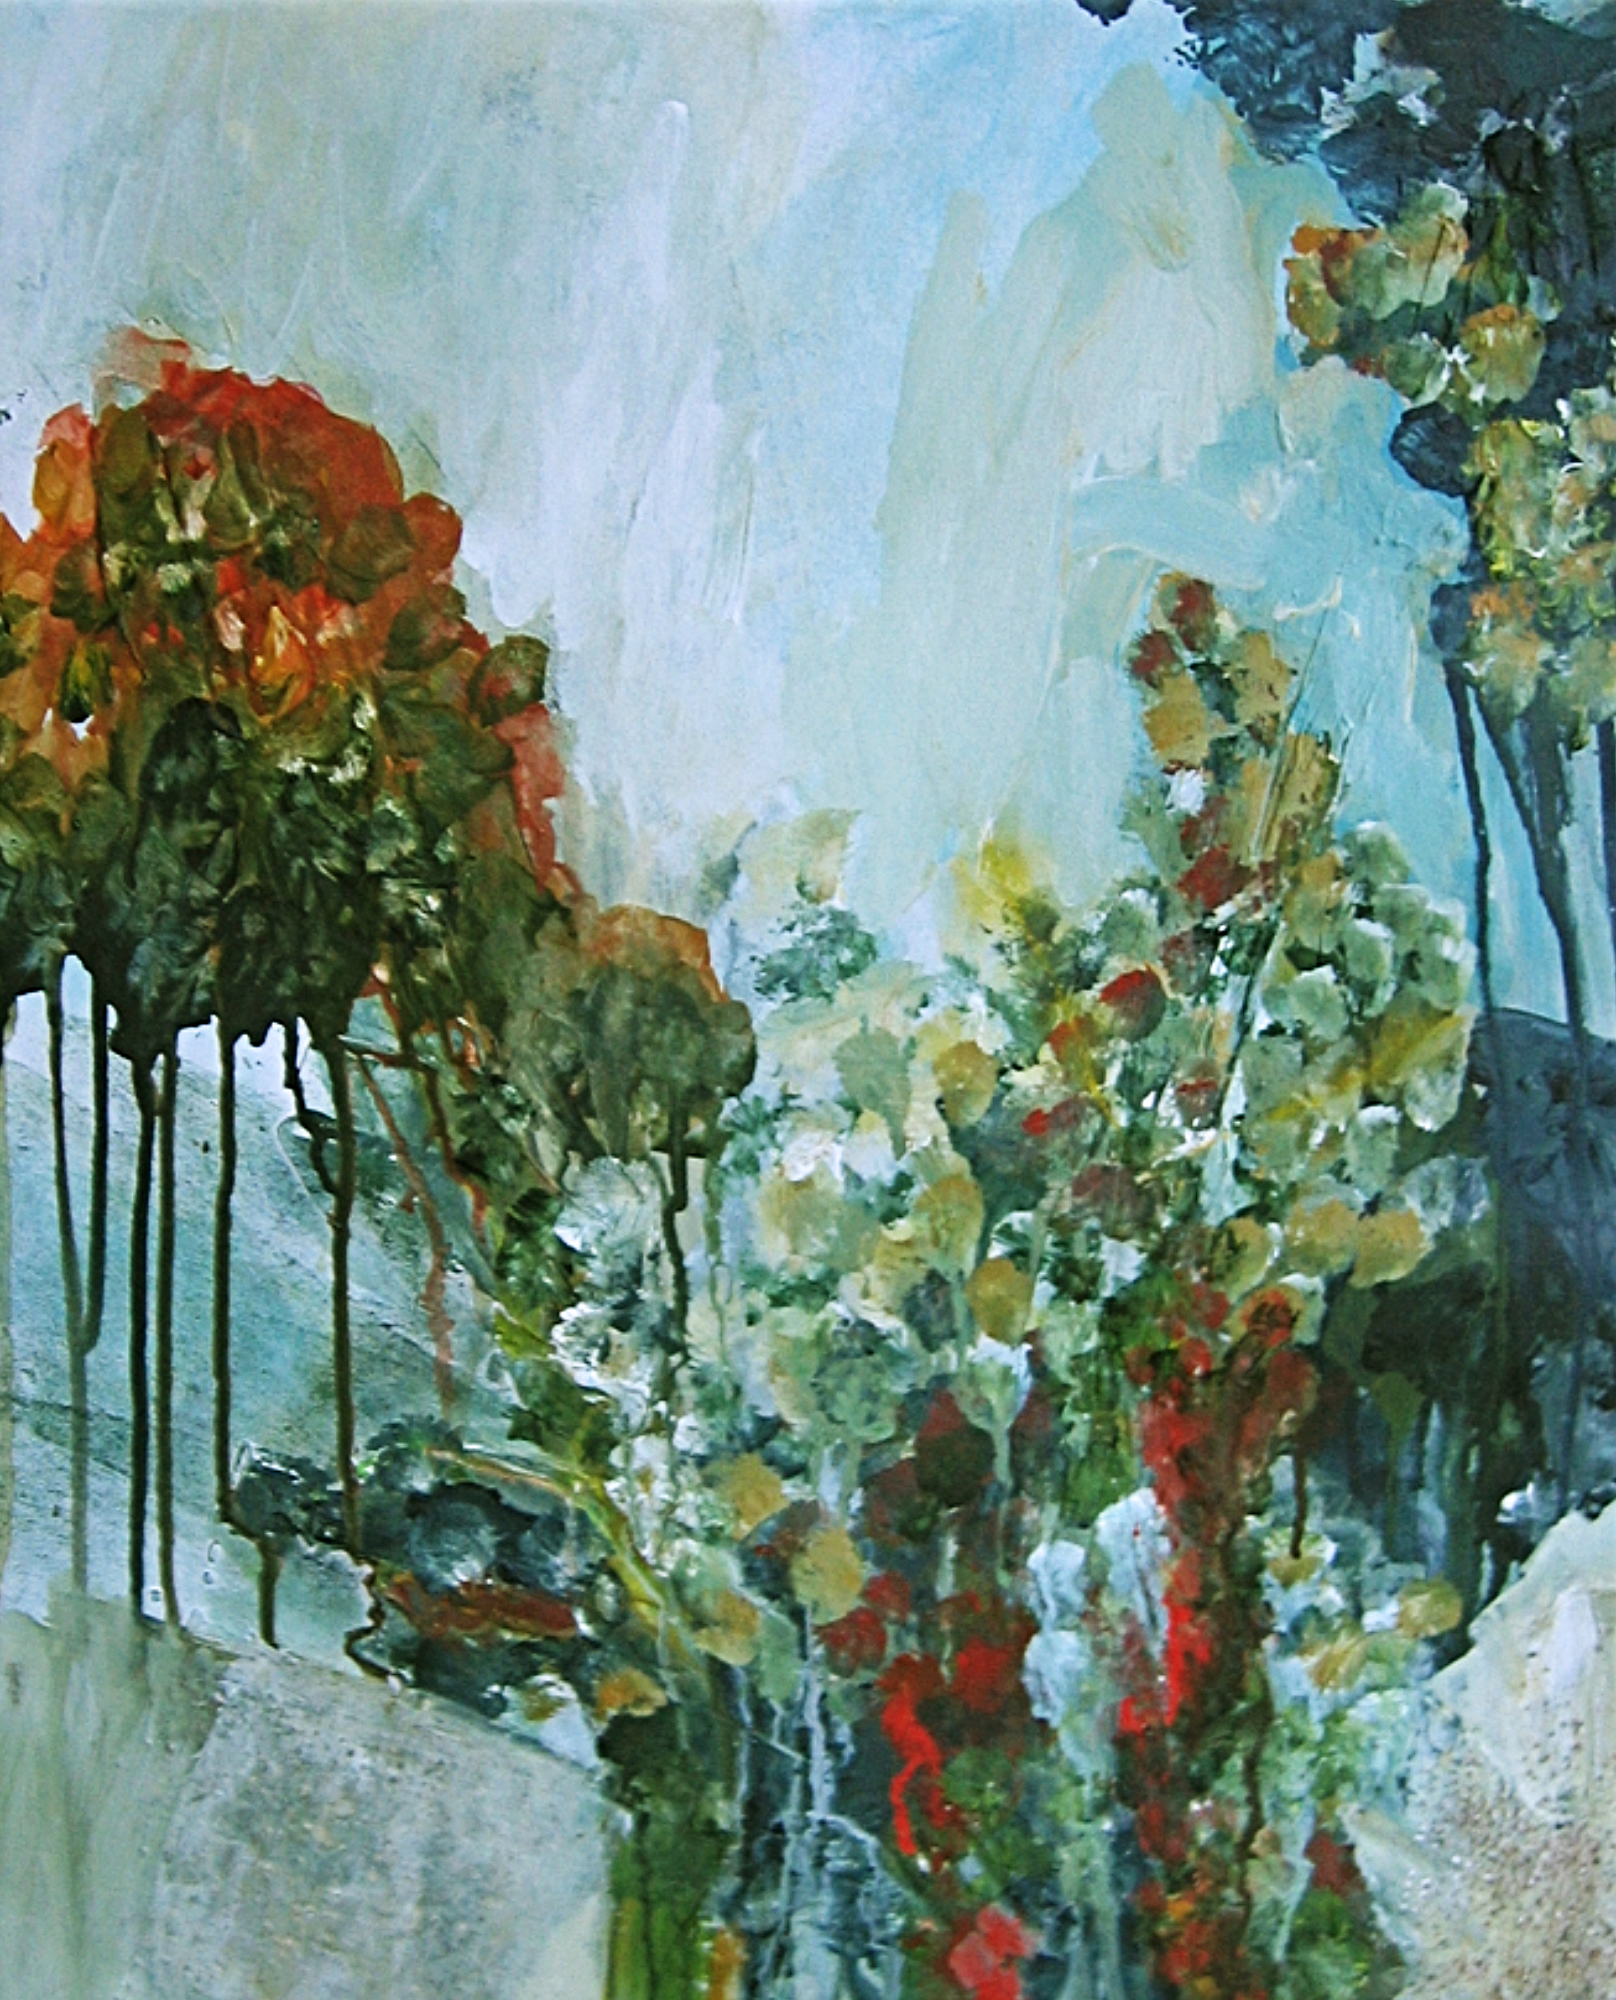 2001 - Herbststimmung, 50x40cm, Aquarell